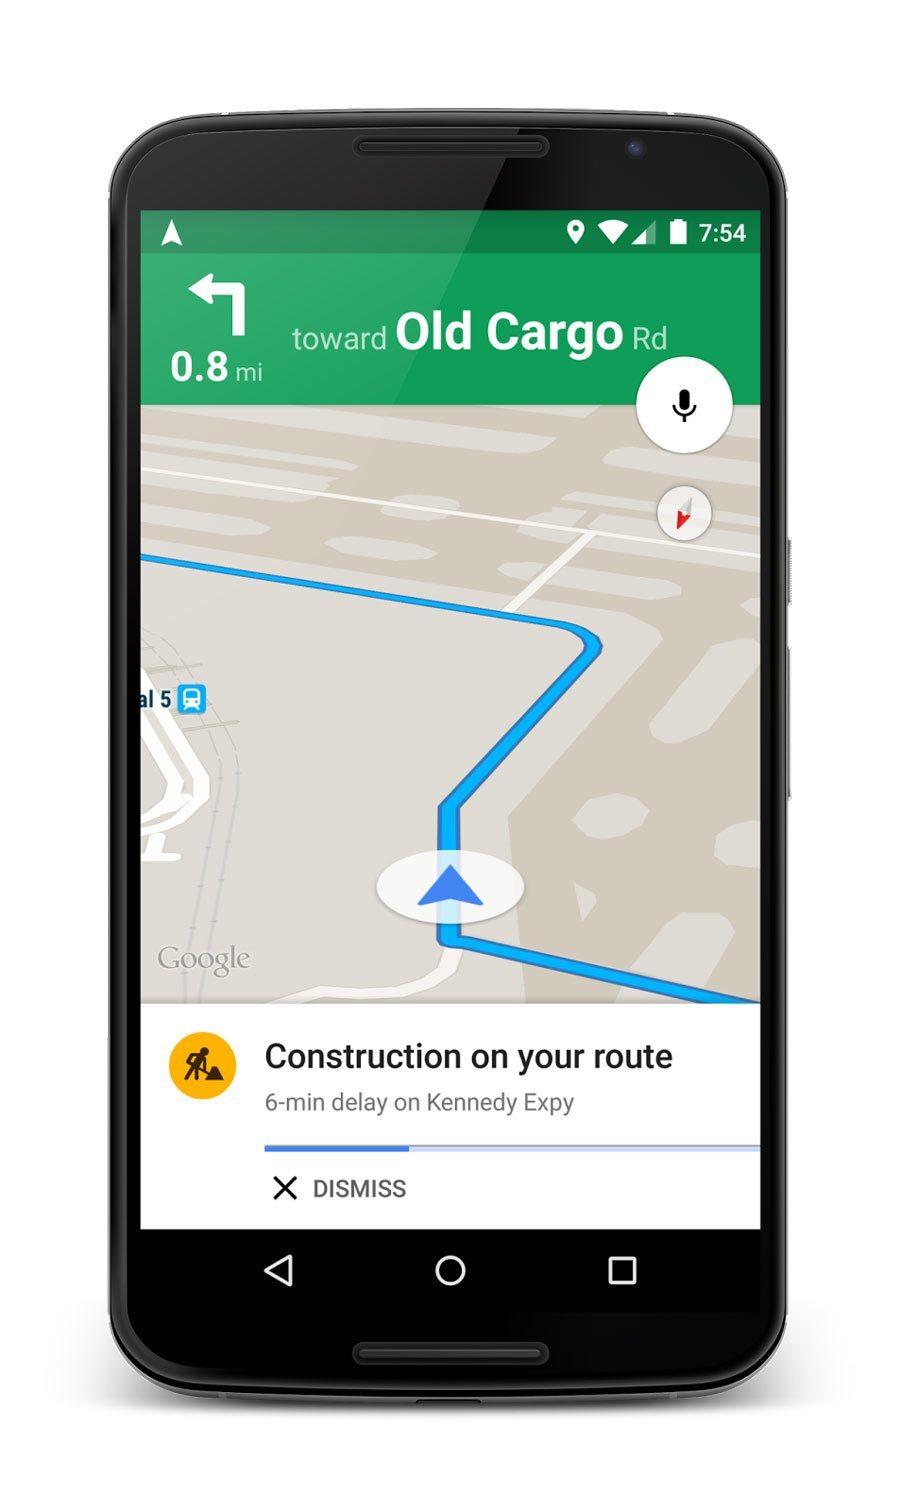 Technik_Google_Maps_App_Phone_Shot_2